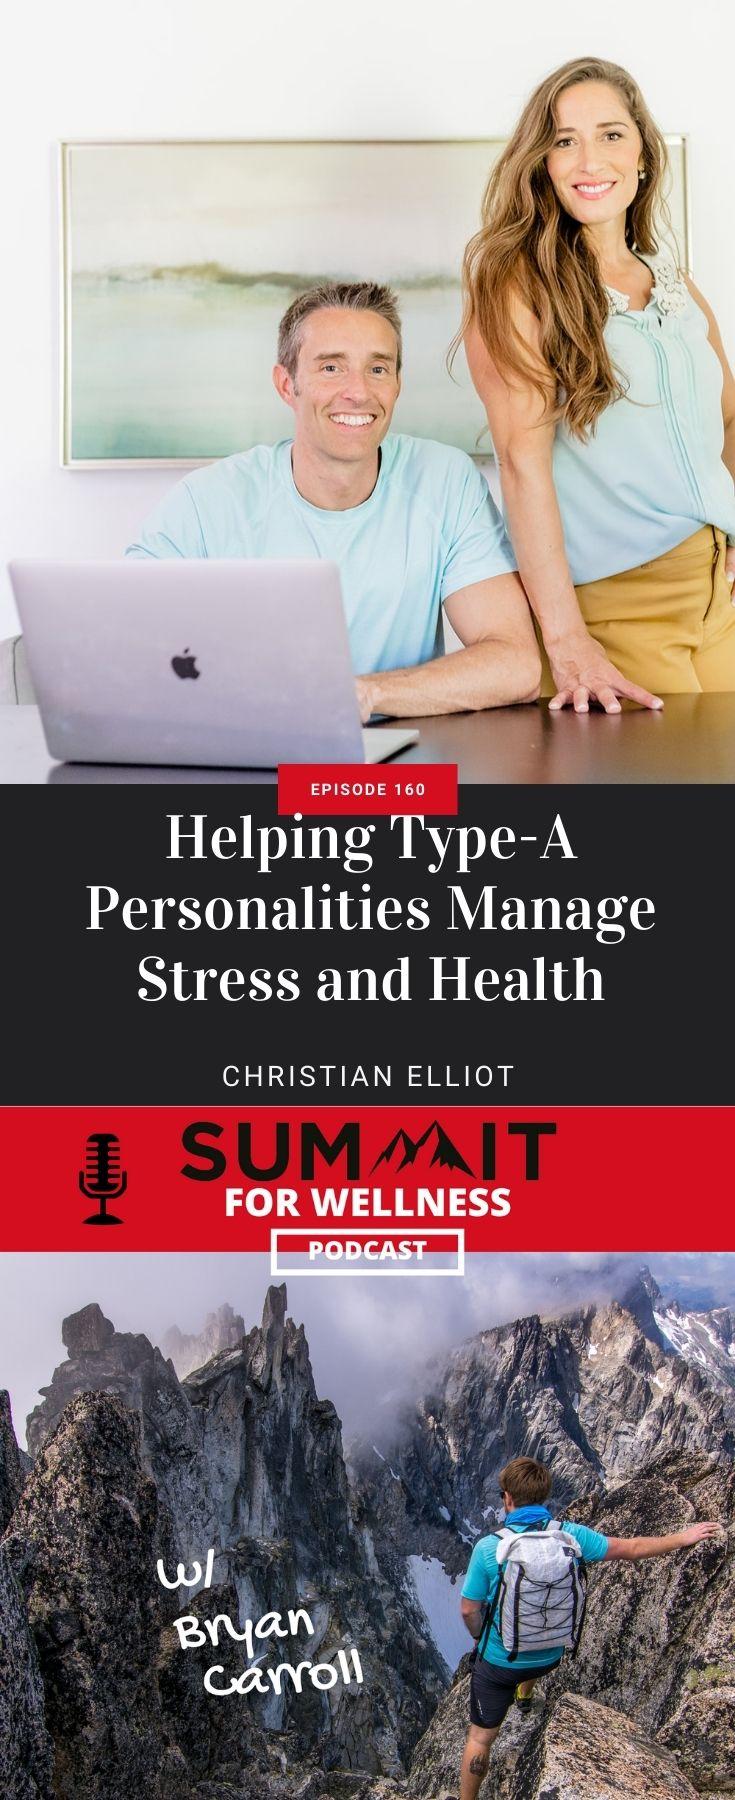 Christian Elliot teaches how to manage stress